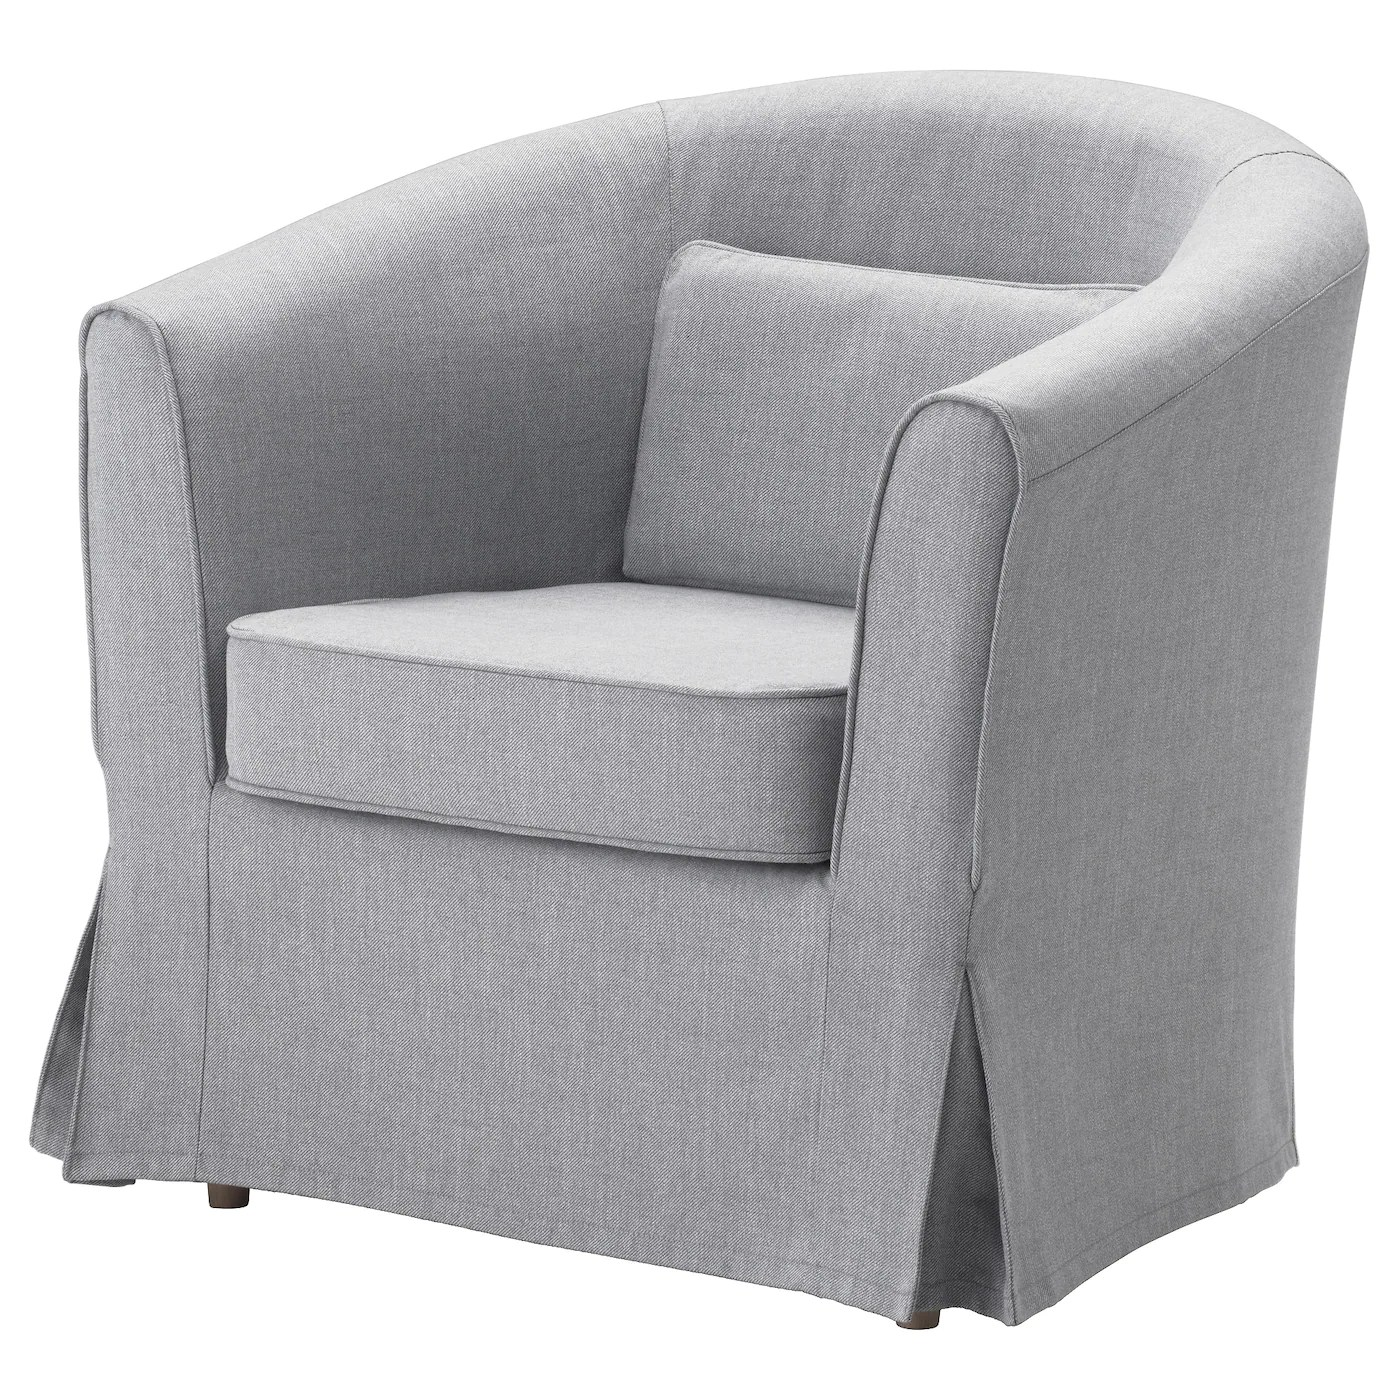 tub chair covers ireland sleeper chairs amazon fabric armchairs ikea tullsta armchair slim lines easy to place